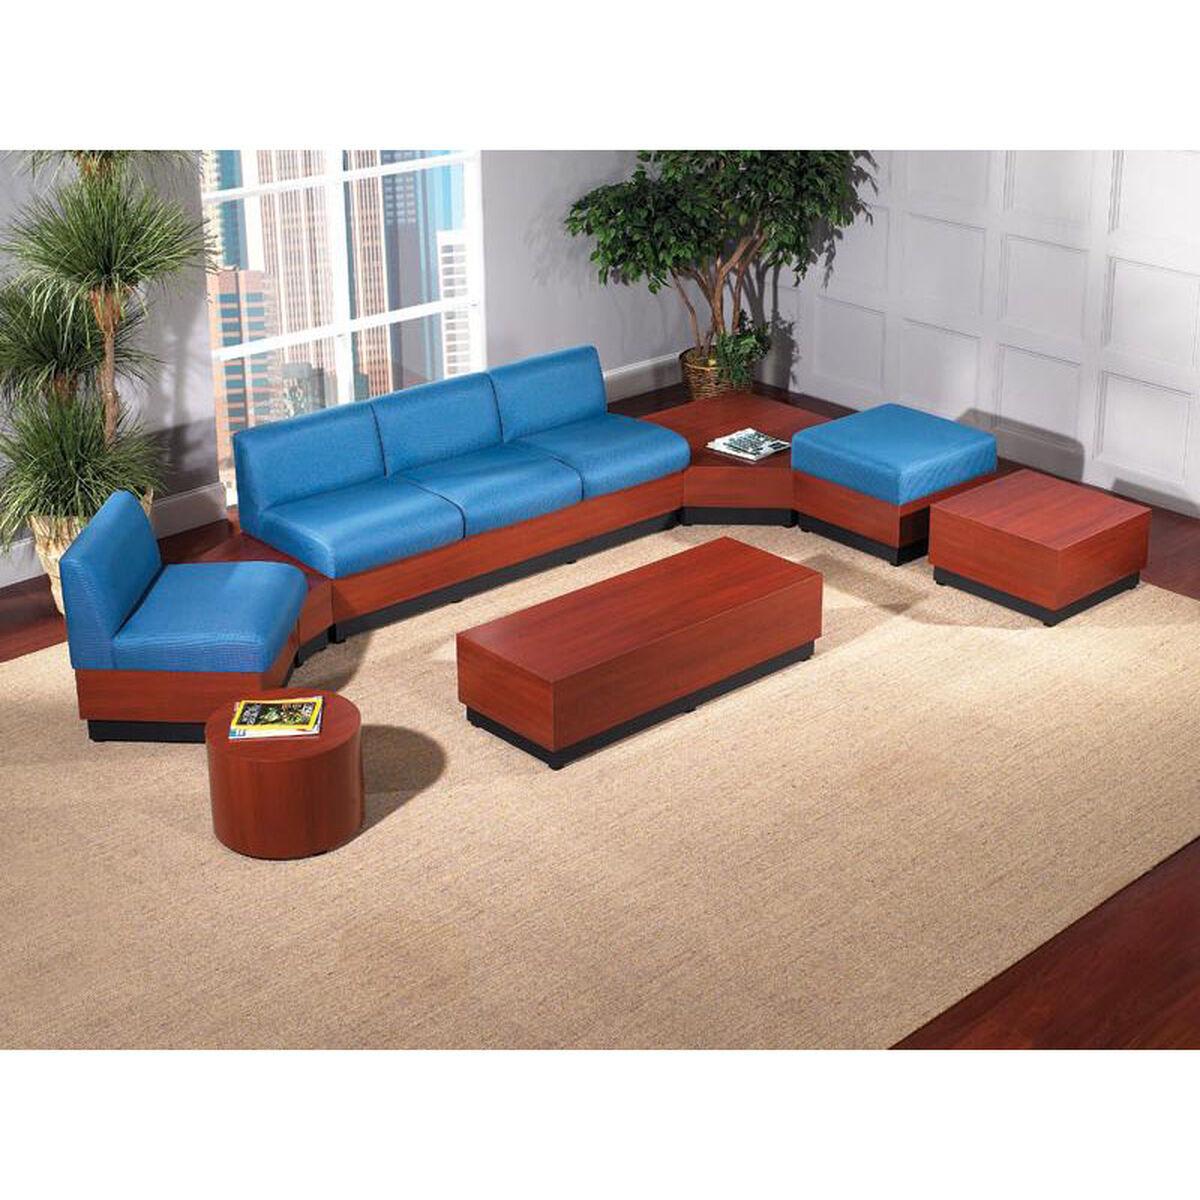 High Point Furniture Industries Quick Ship 7300 Modular